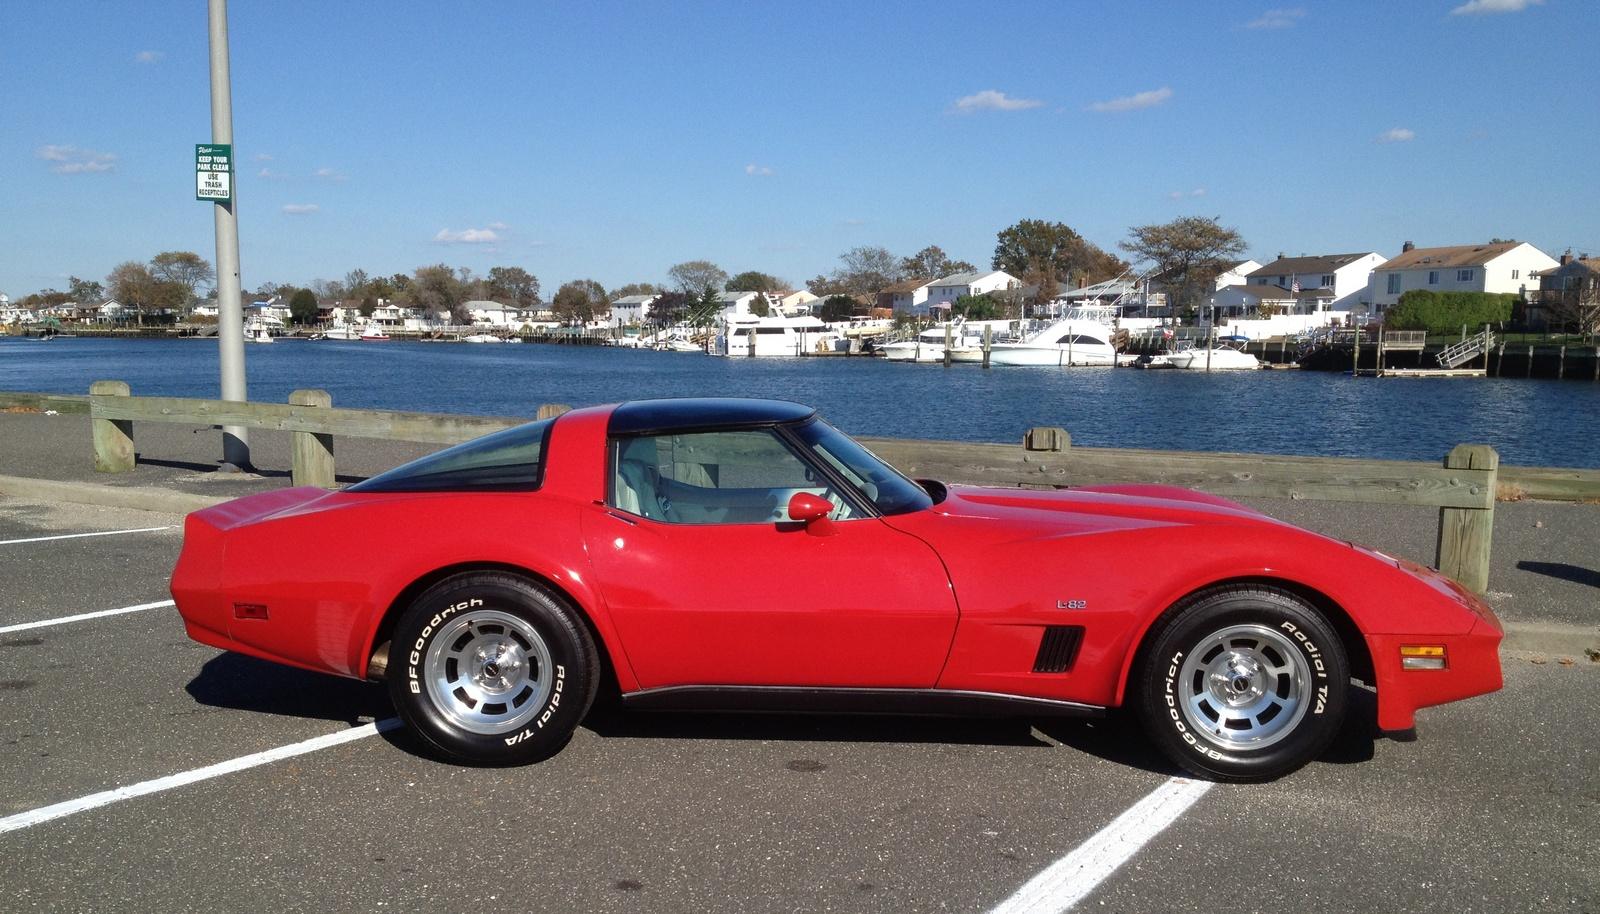 2007 Corvette For Sale >> 1980 Chevrolet Corvette - Pictures - CarGurus